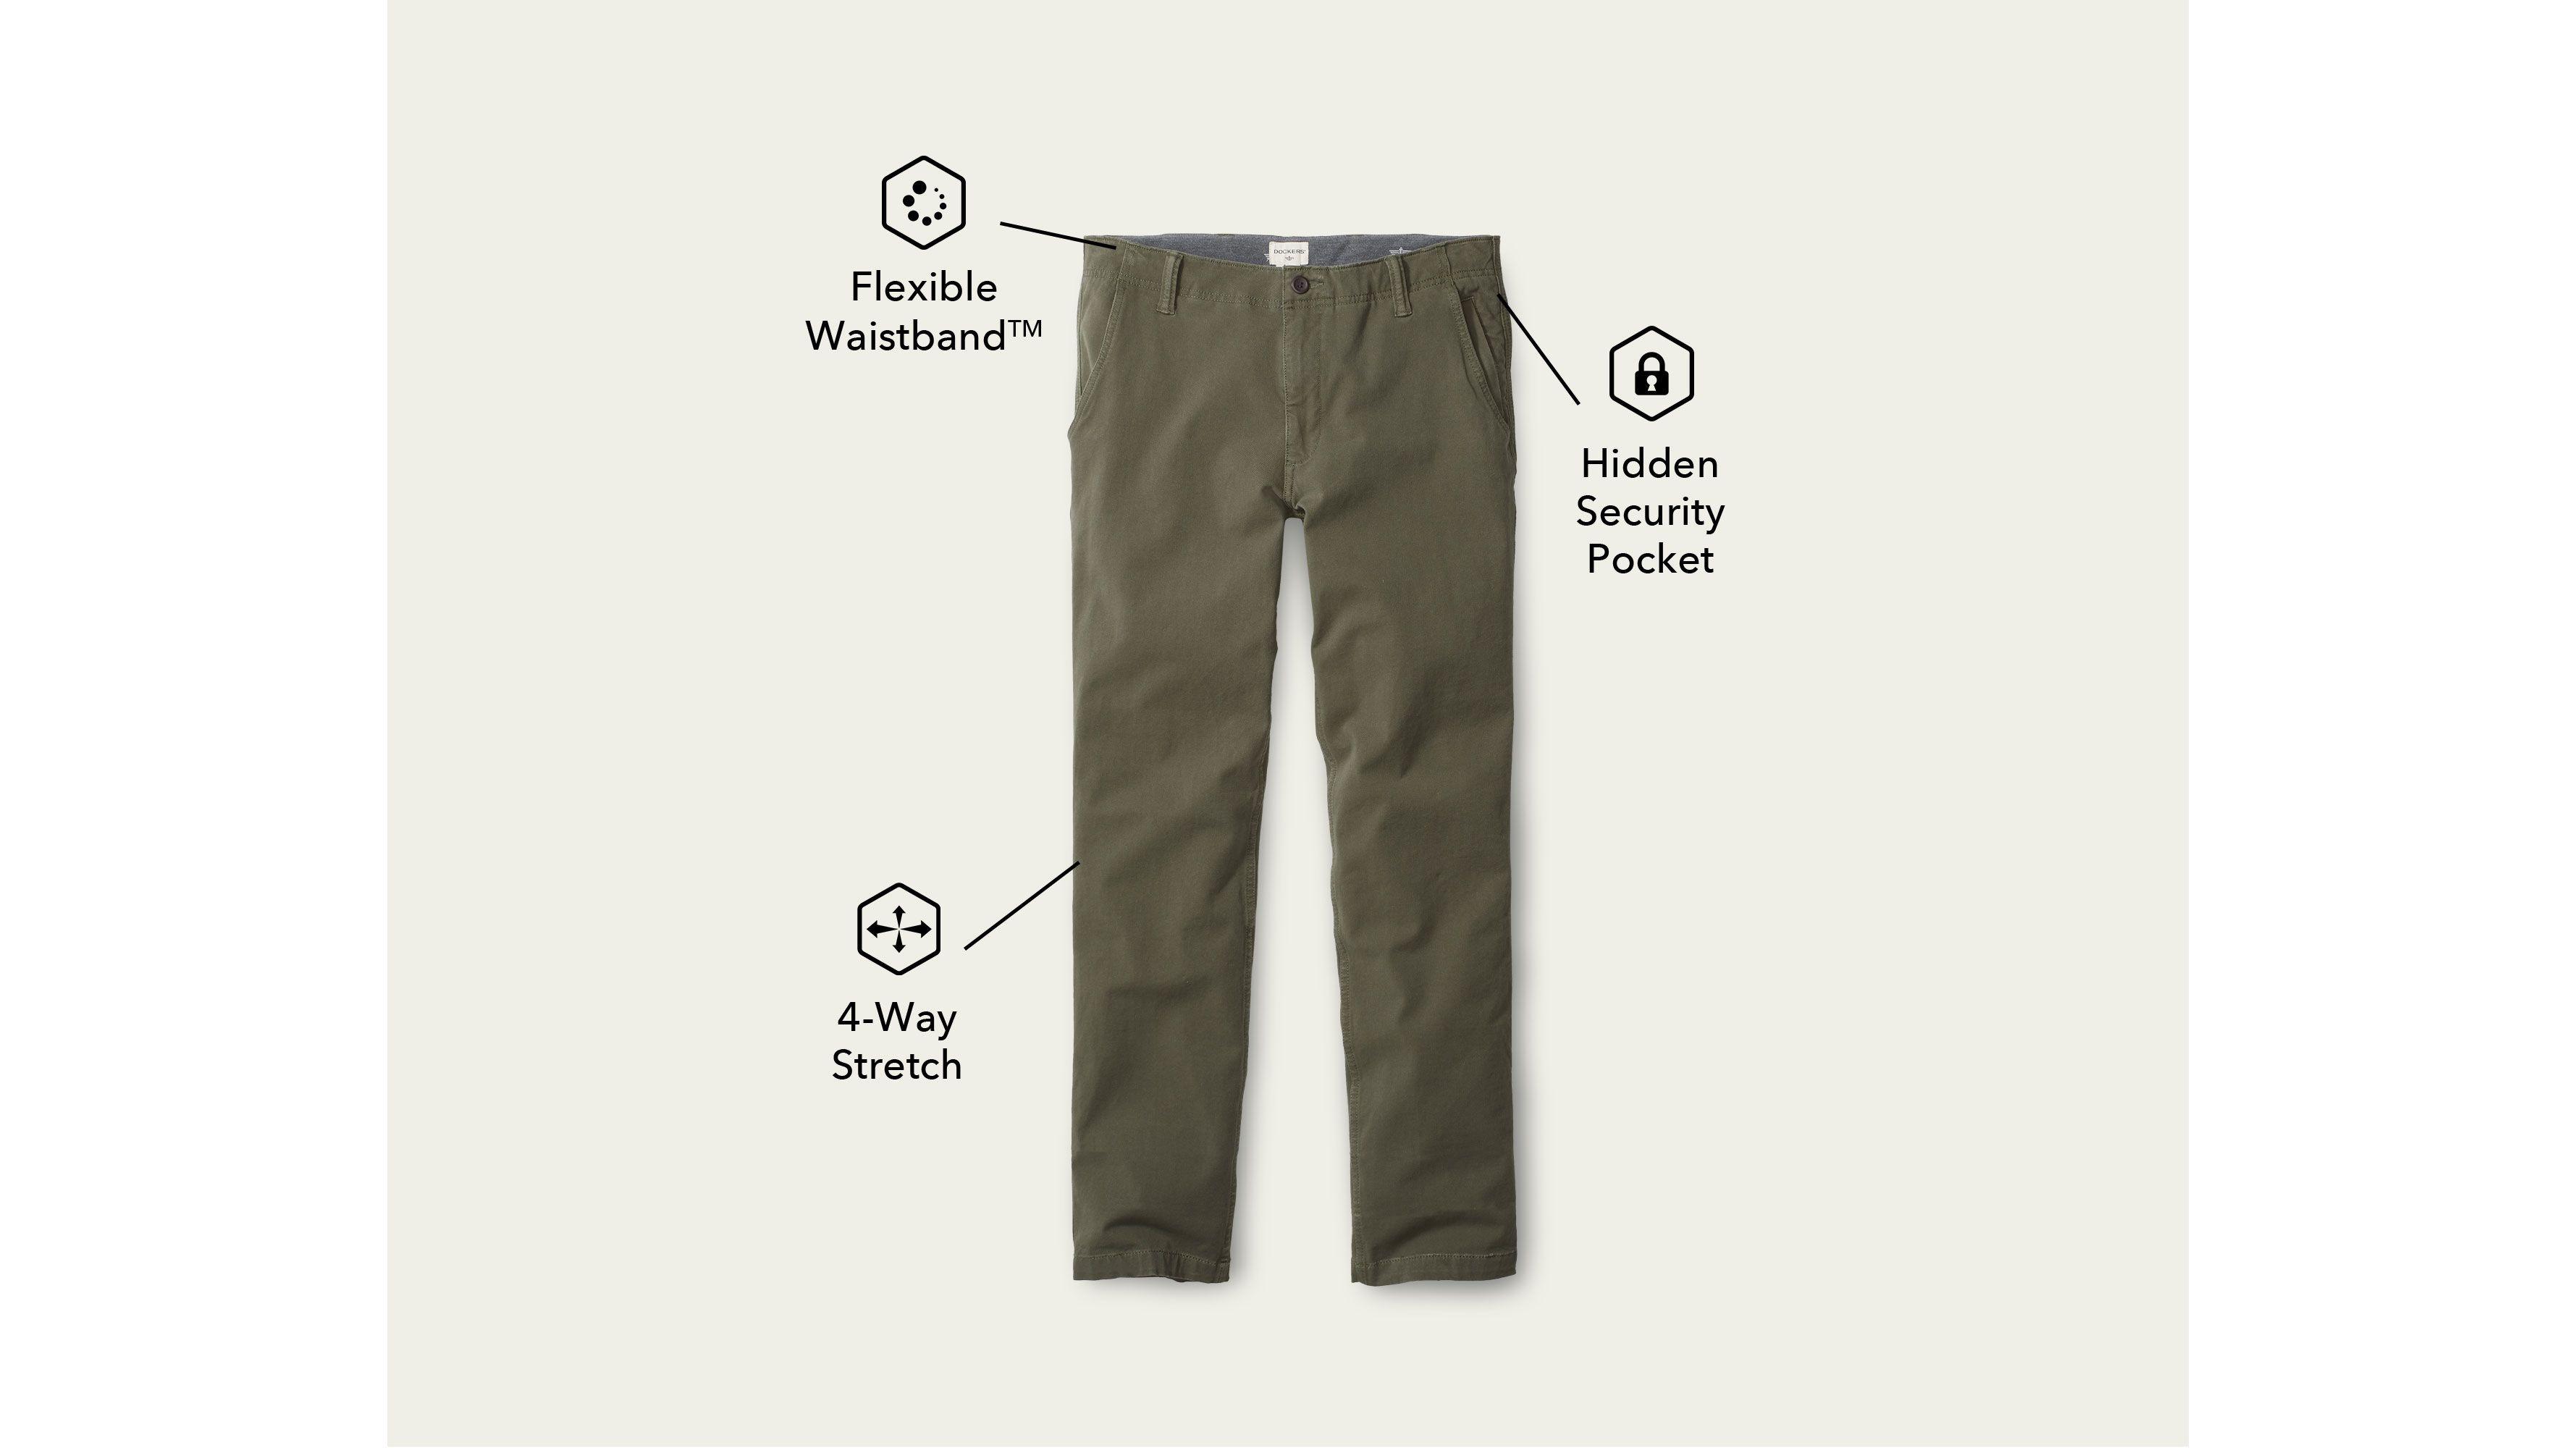 Dockers Mens Skinny Fit Downtime Khaki Smart 360 Flex Pants